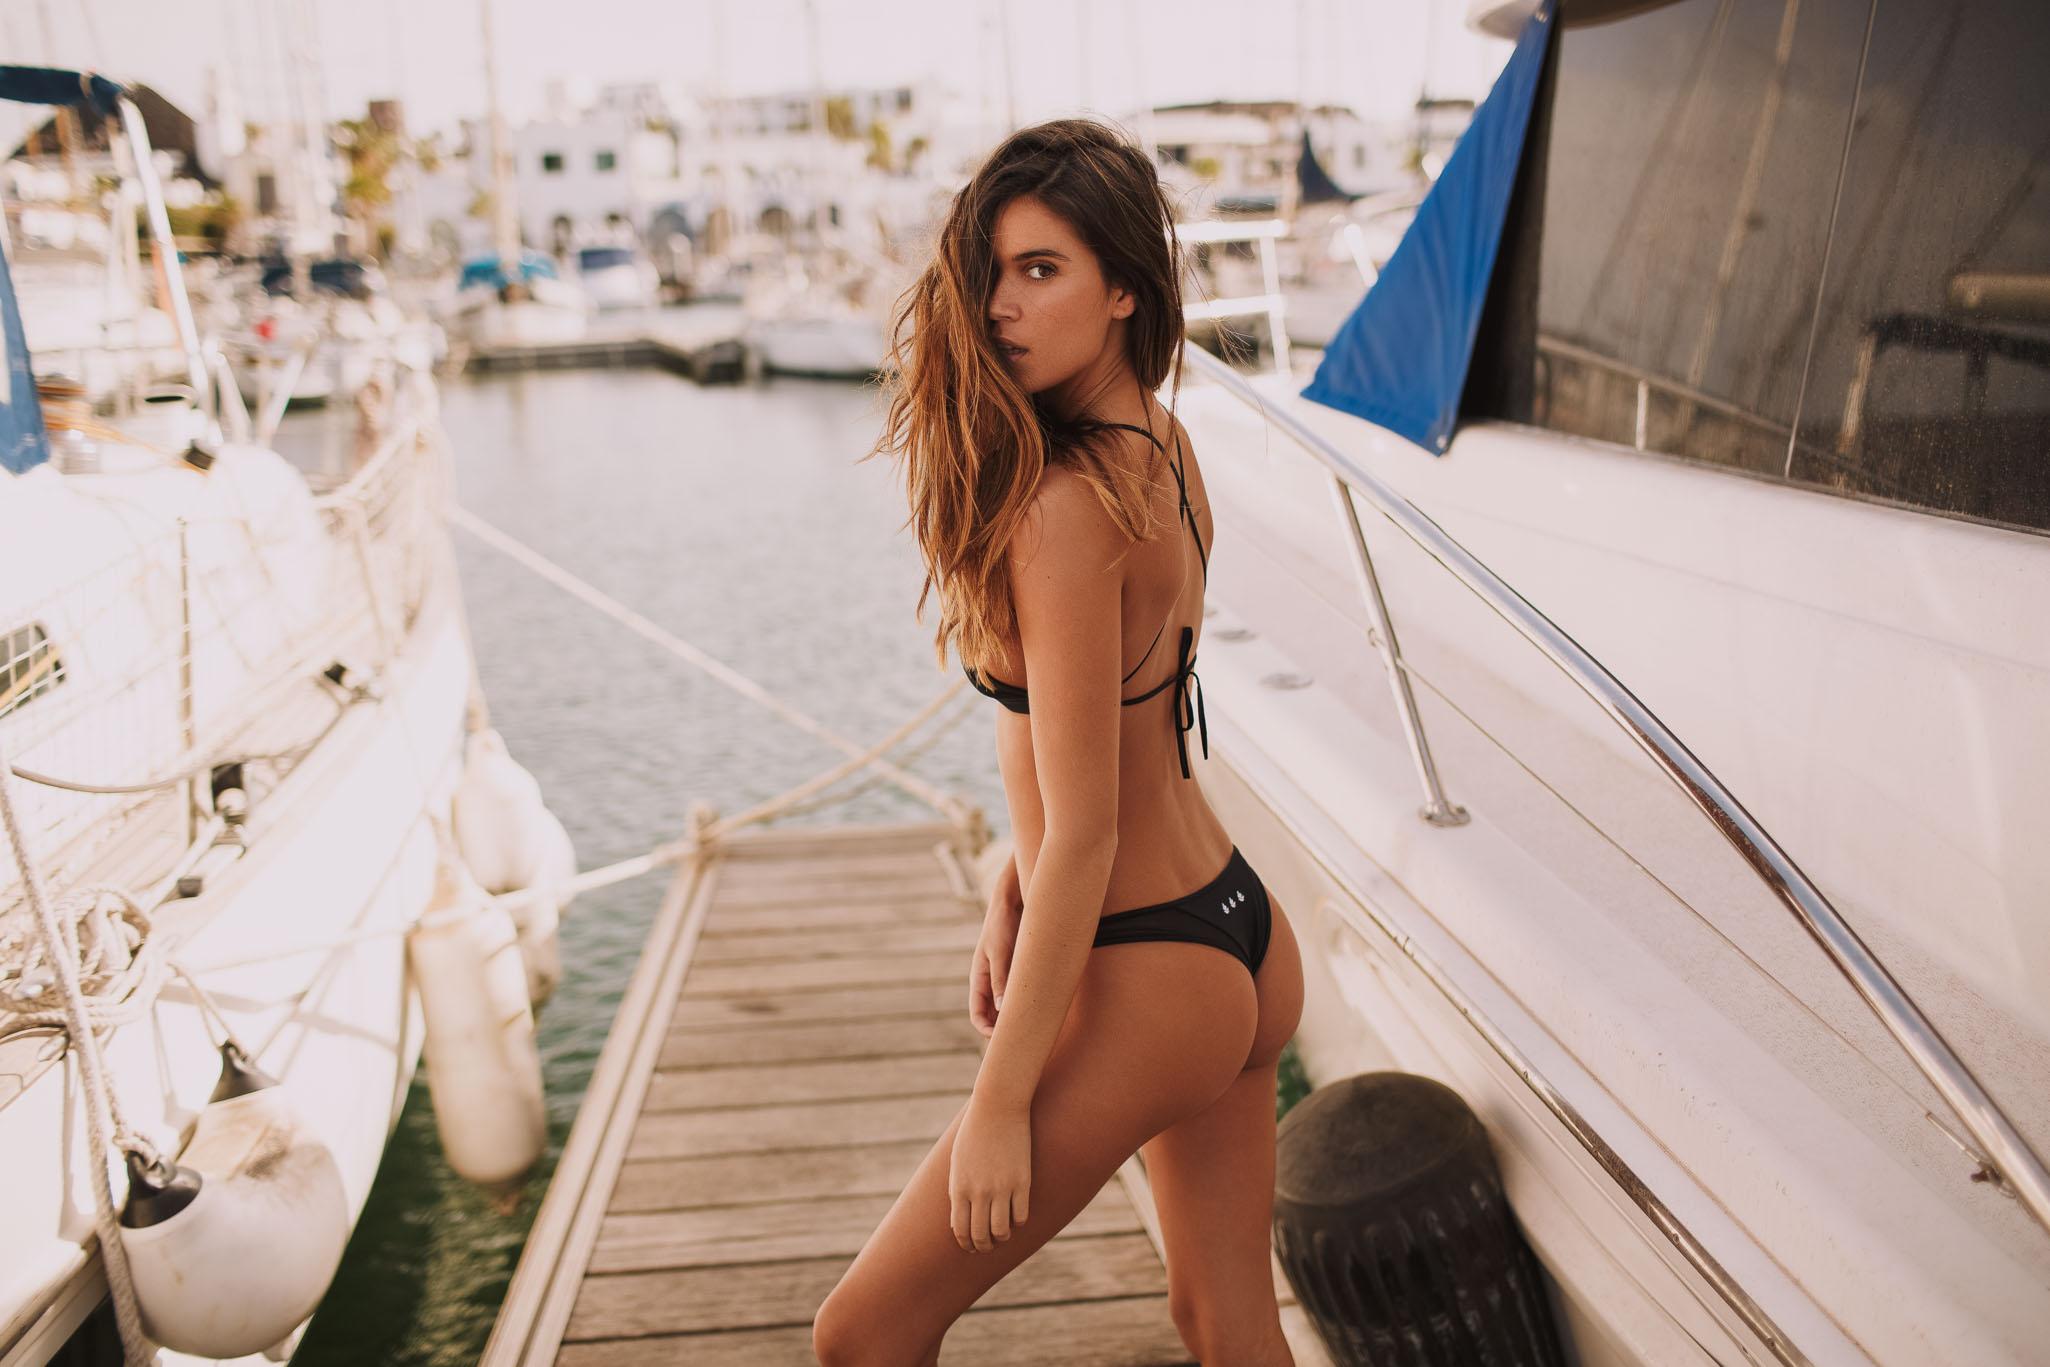 Swimwear-photographer-jeremy-boyer-maillot-de-bain-lifestyle-mode-fashion-swimsuit-13.jpg